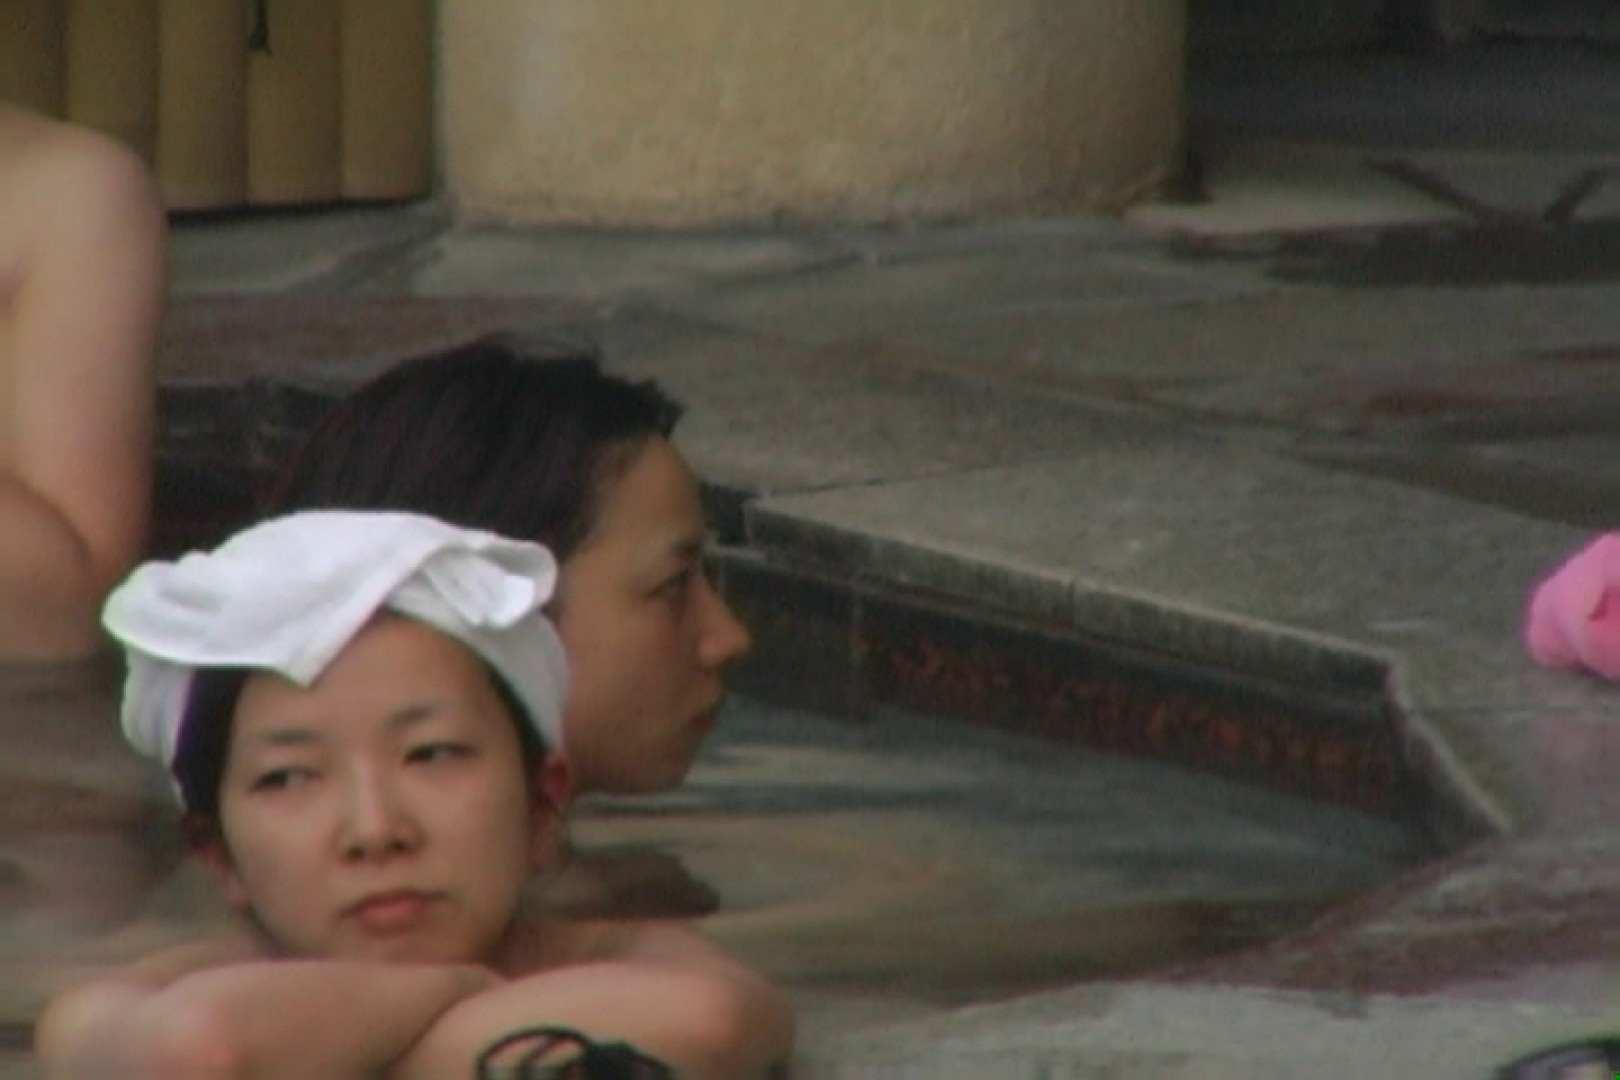 Aquaな露天風呂Vol.613 盗撮師作品 | 露天風呂突入  103pic 34